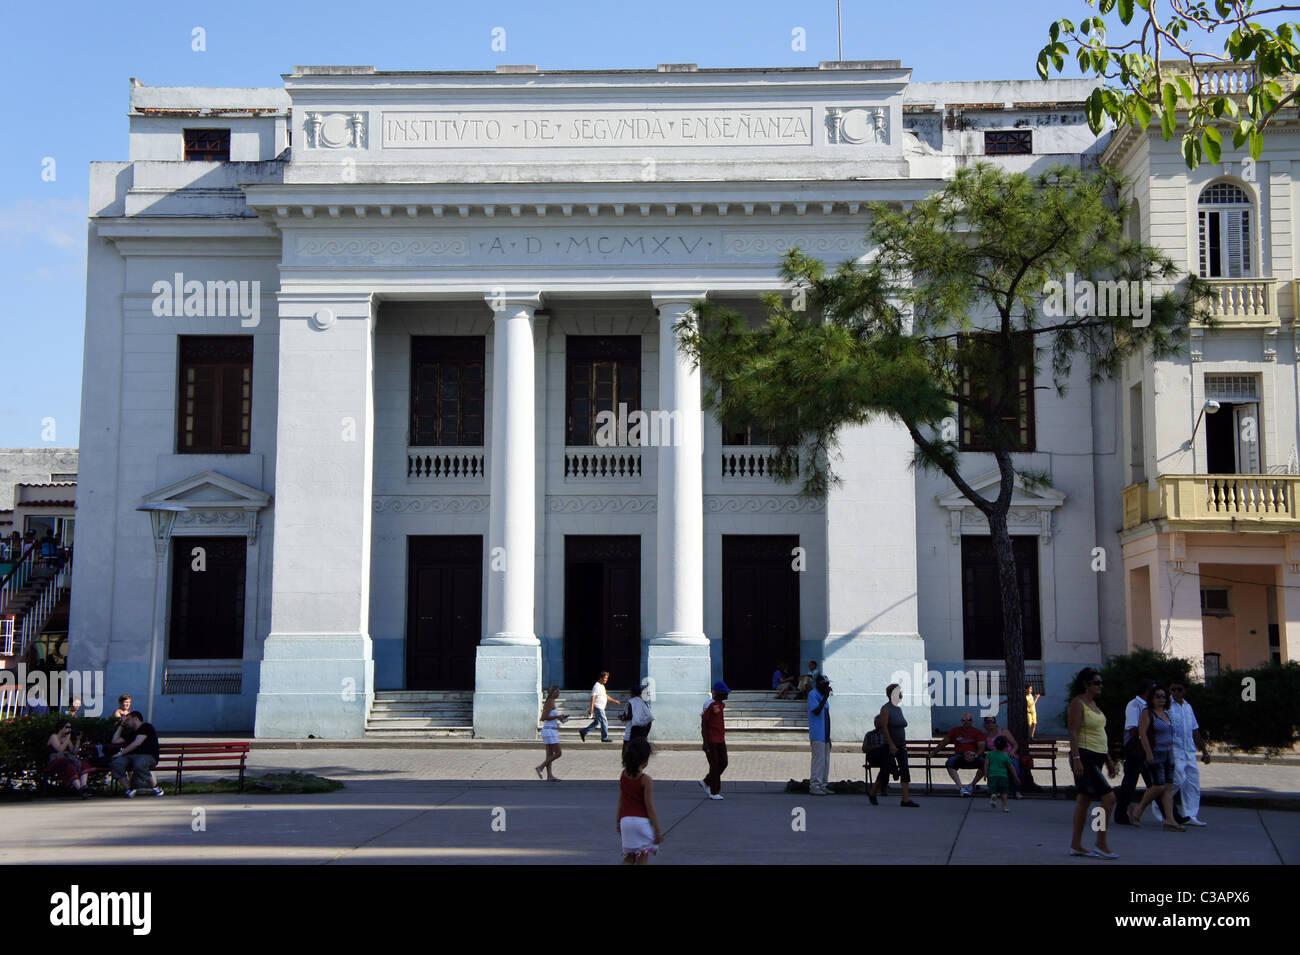 Institute of Secondary Education building, Parque Vidal, Santa Clara, Cuba. Now a cultural centre. - Stock Image